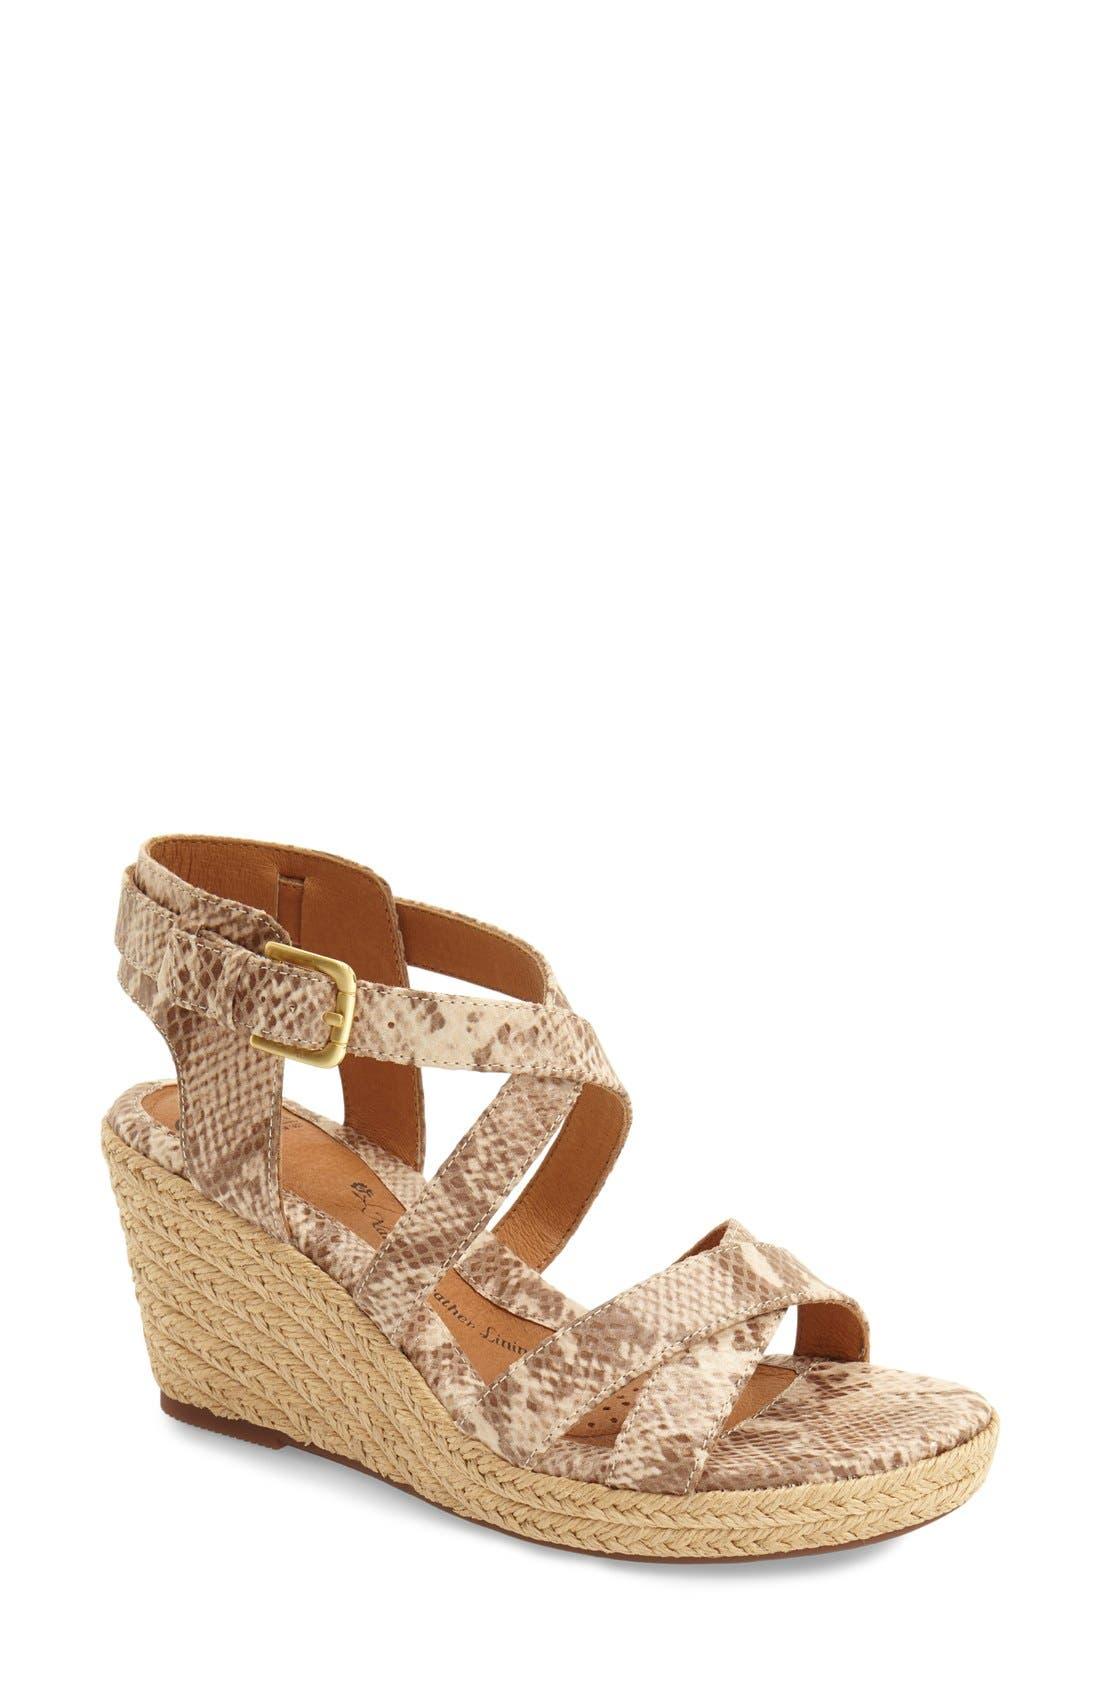 SÖFFT 'Inez' Wedge Sandal